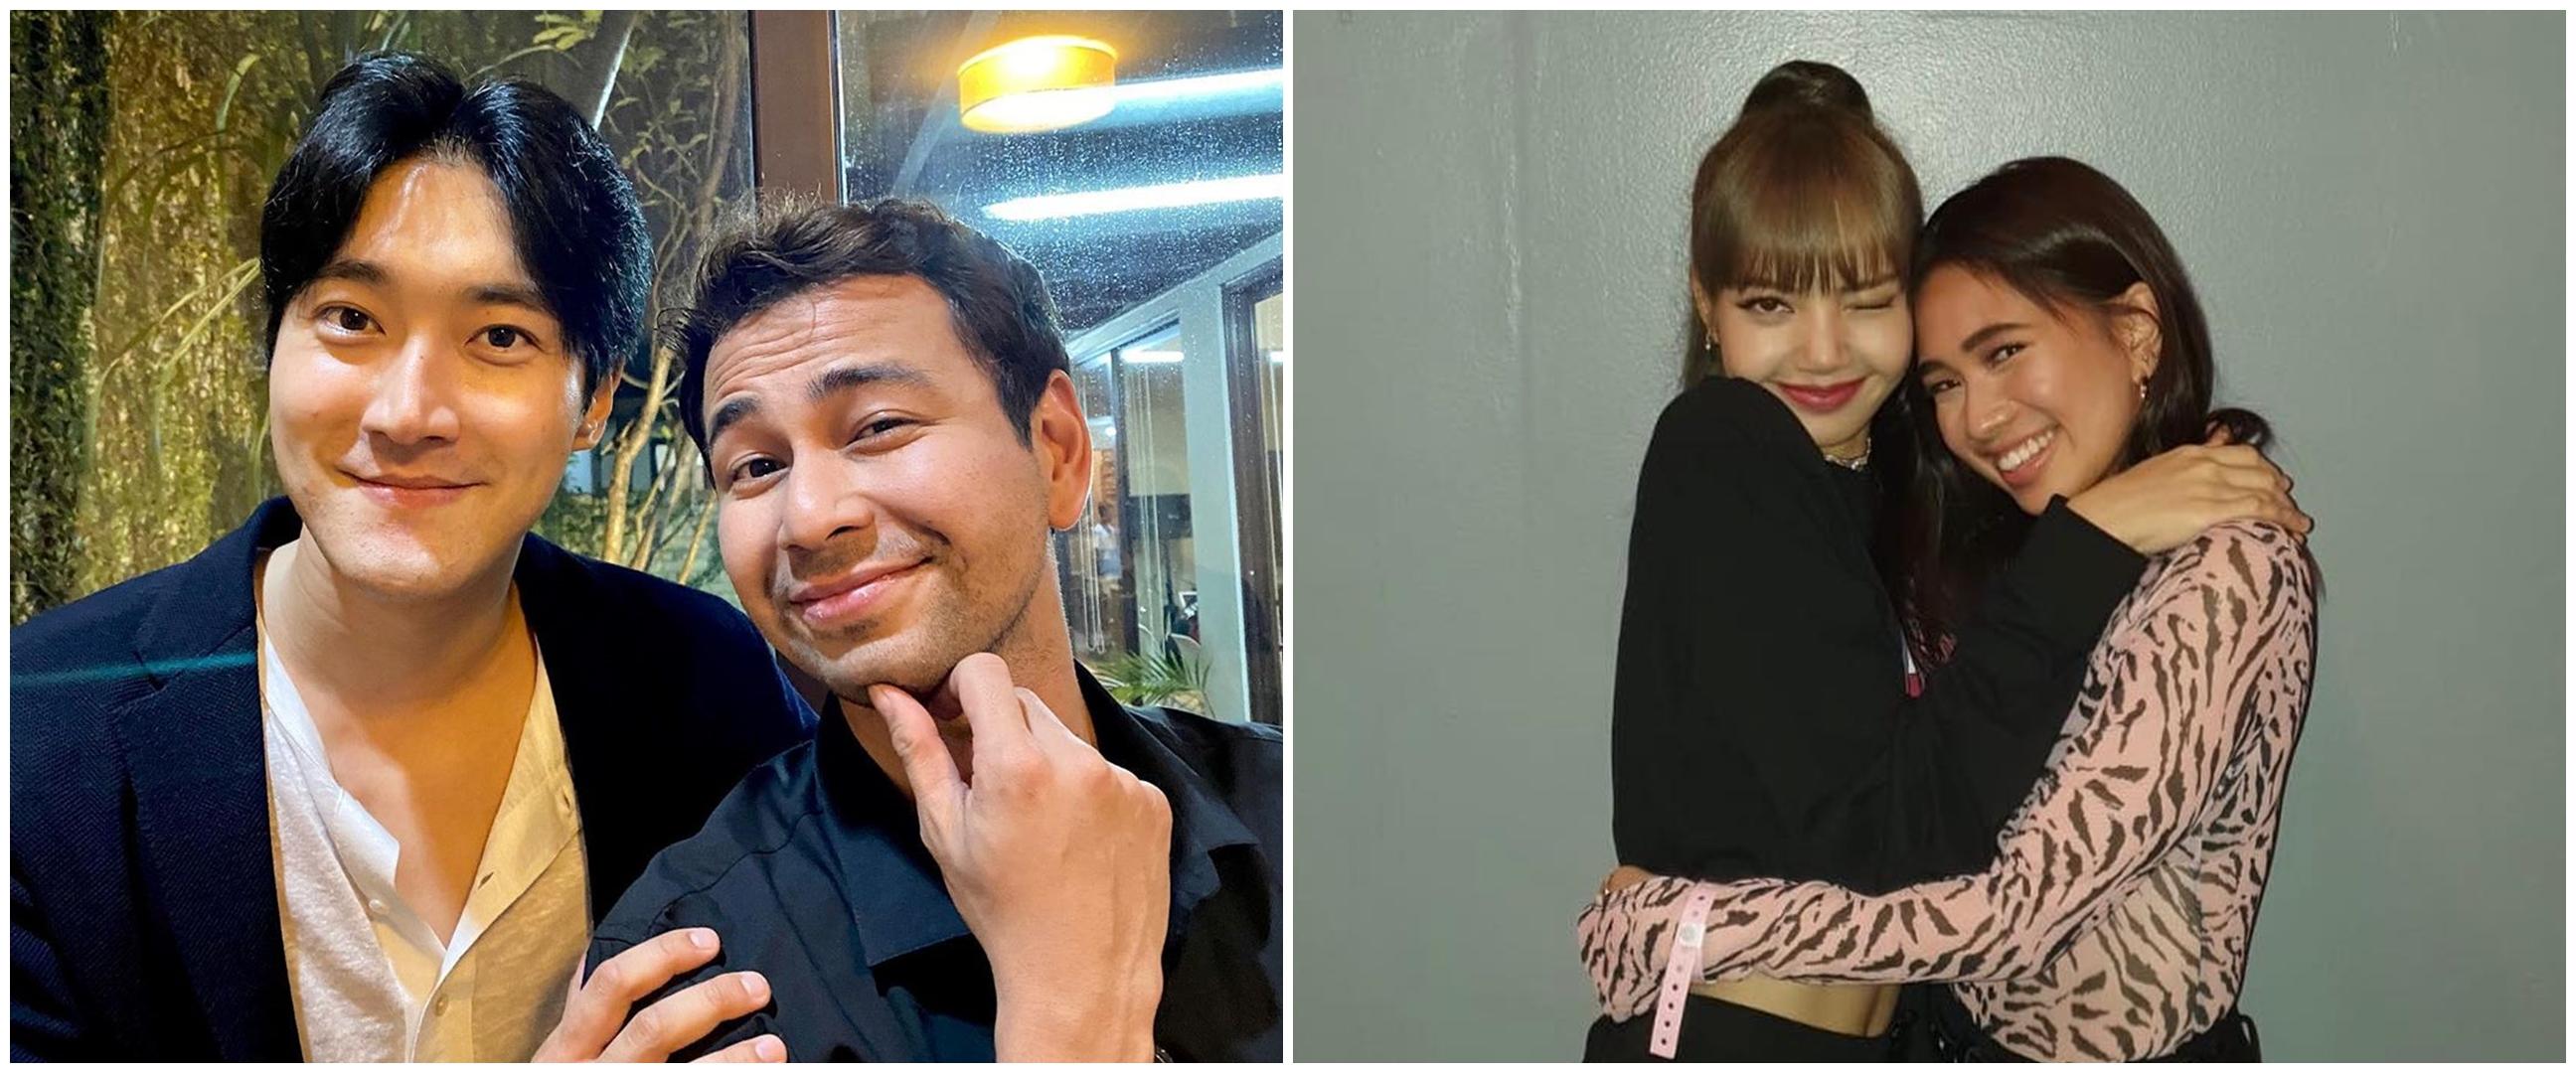 Potret persahabatan 6 seleb Indonesia & idol K-Pop, bak saudara